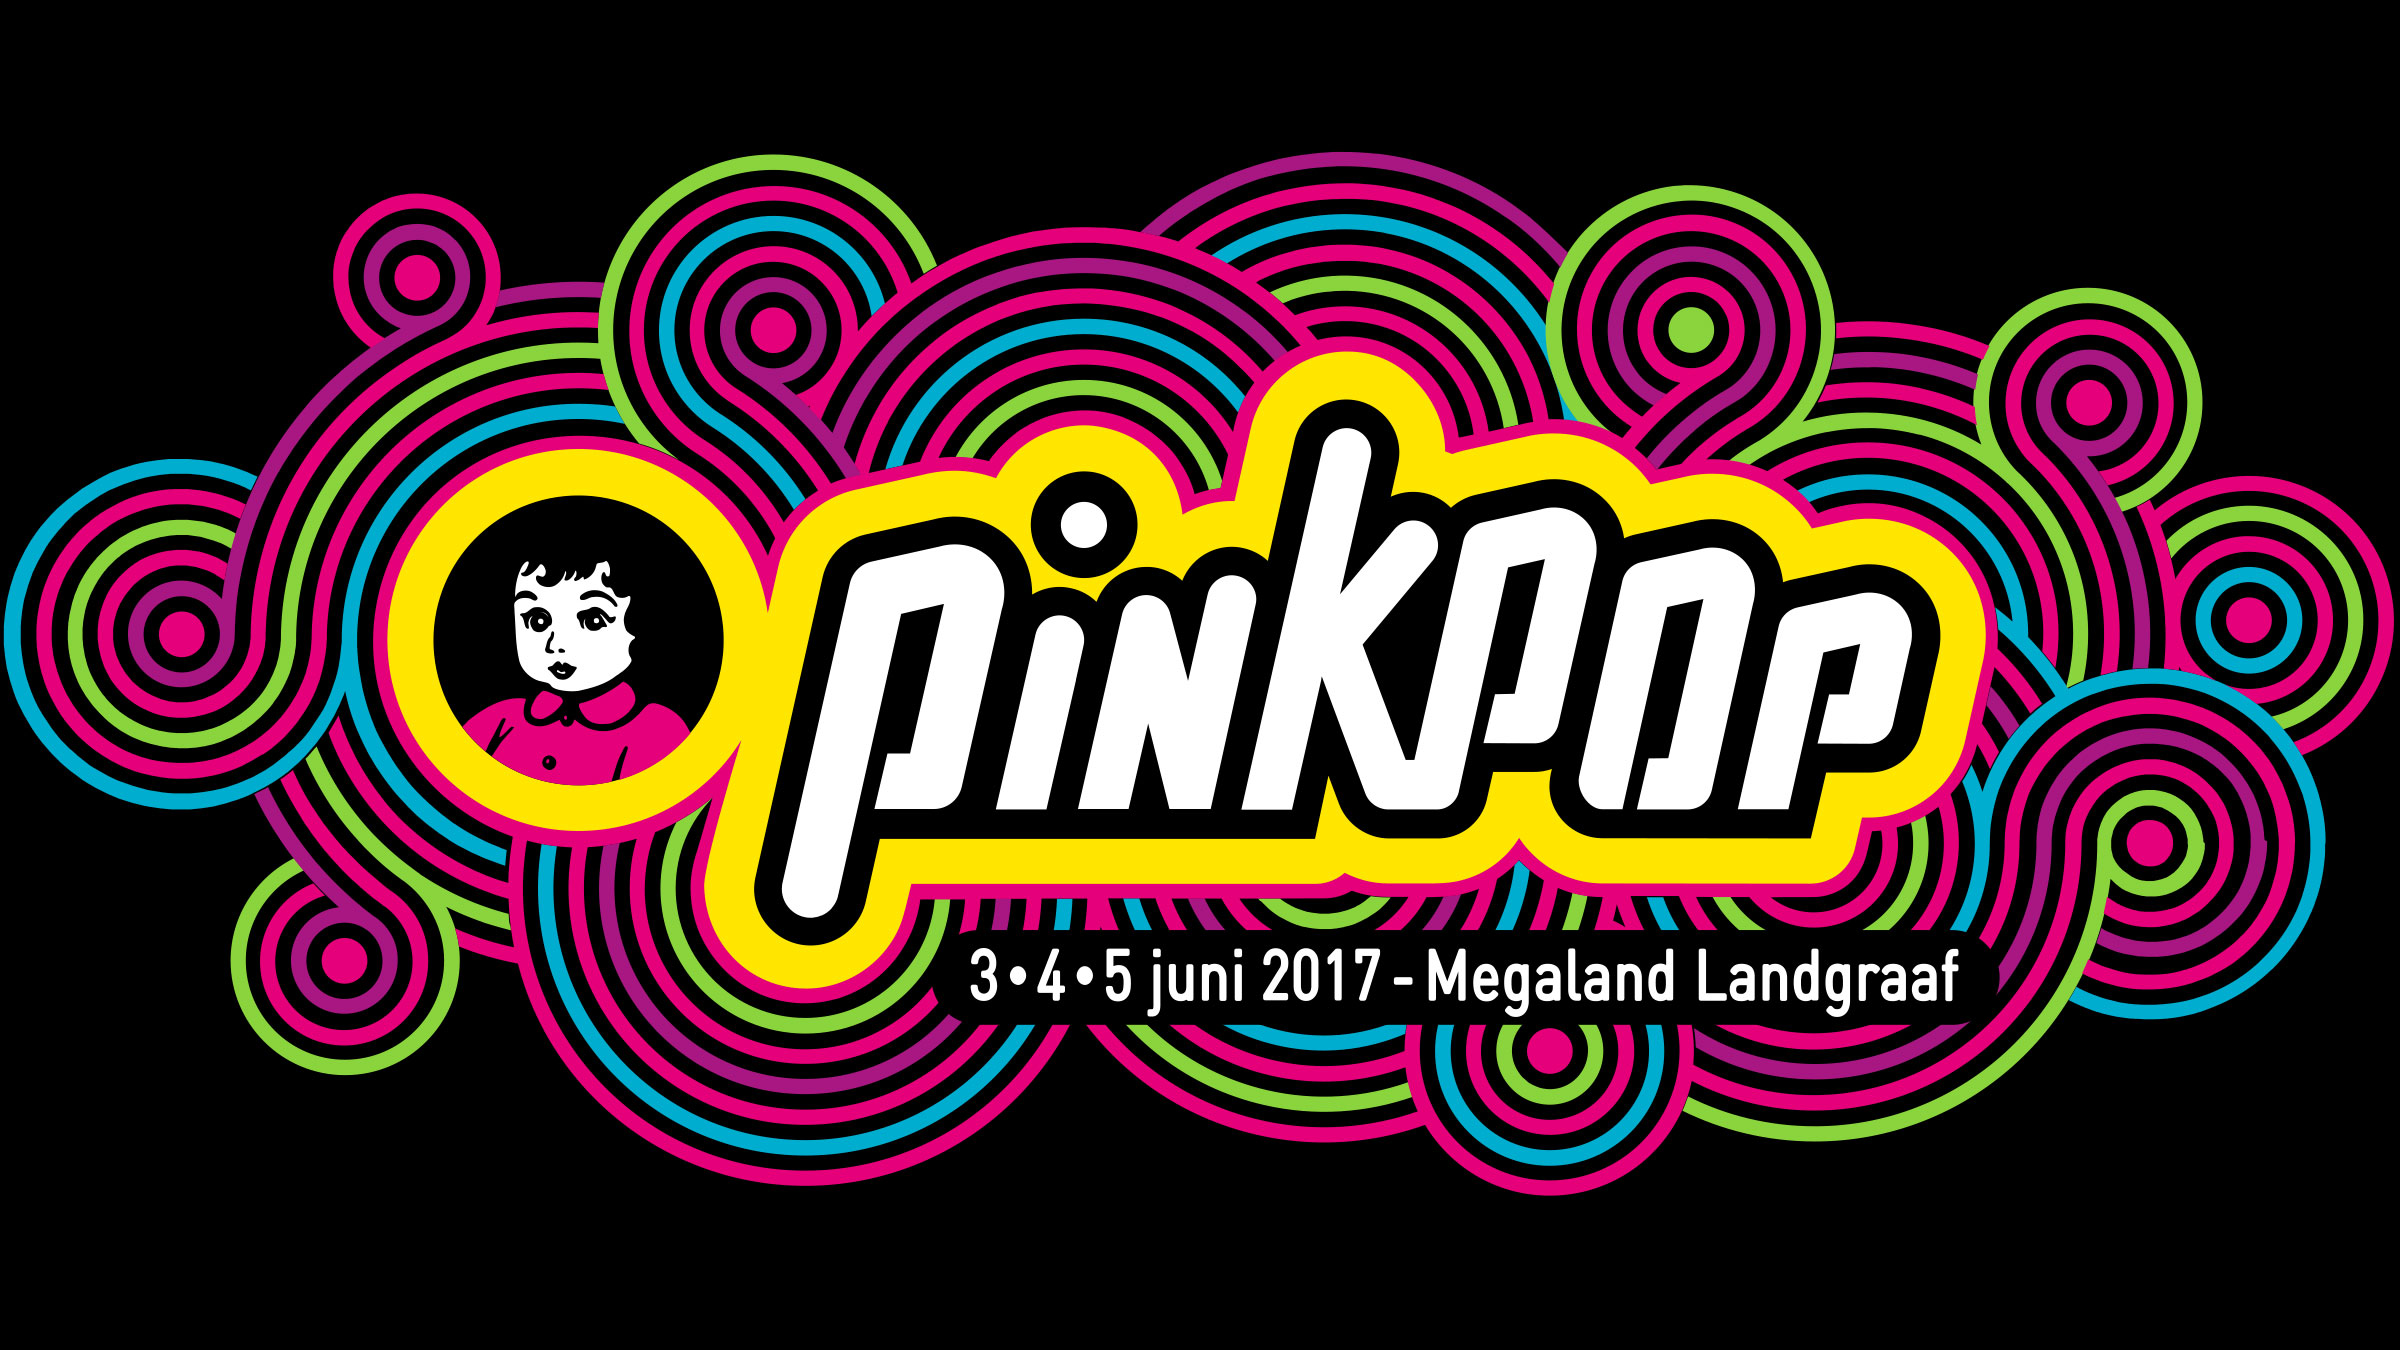 Pinkpop 2017 teaser